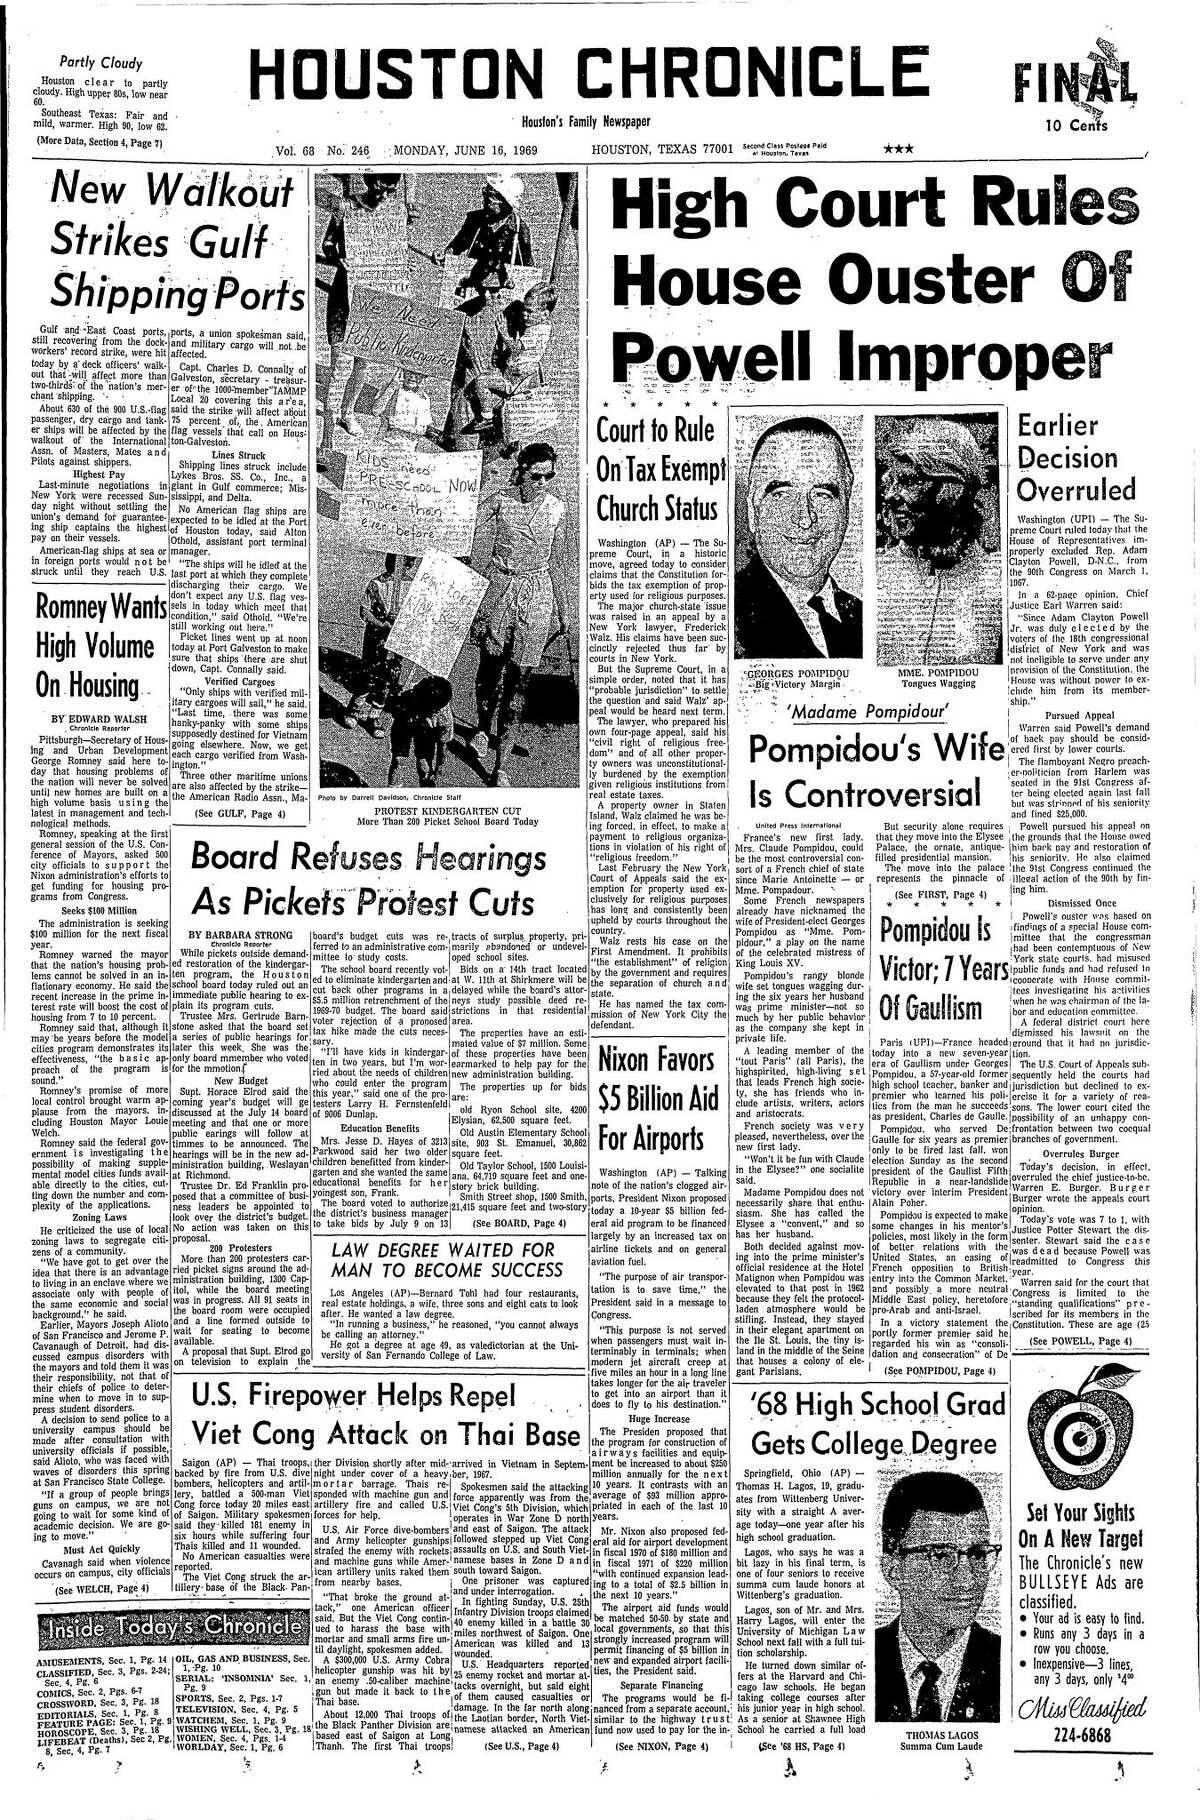 June 16, 1969